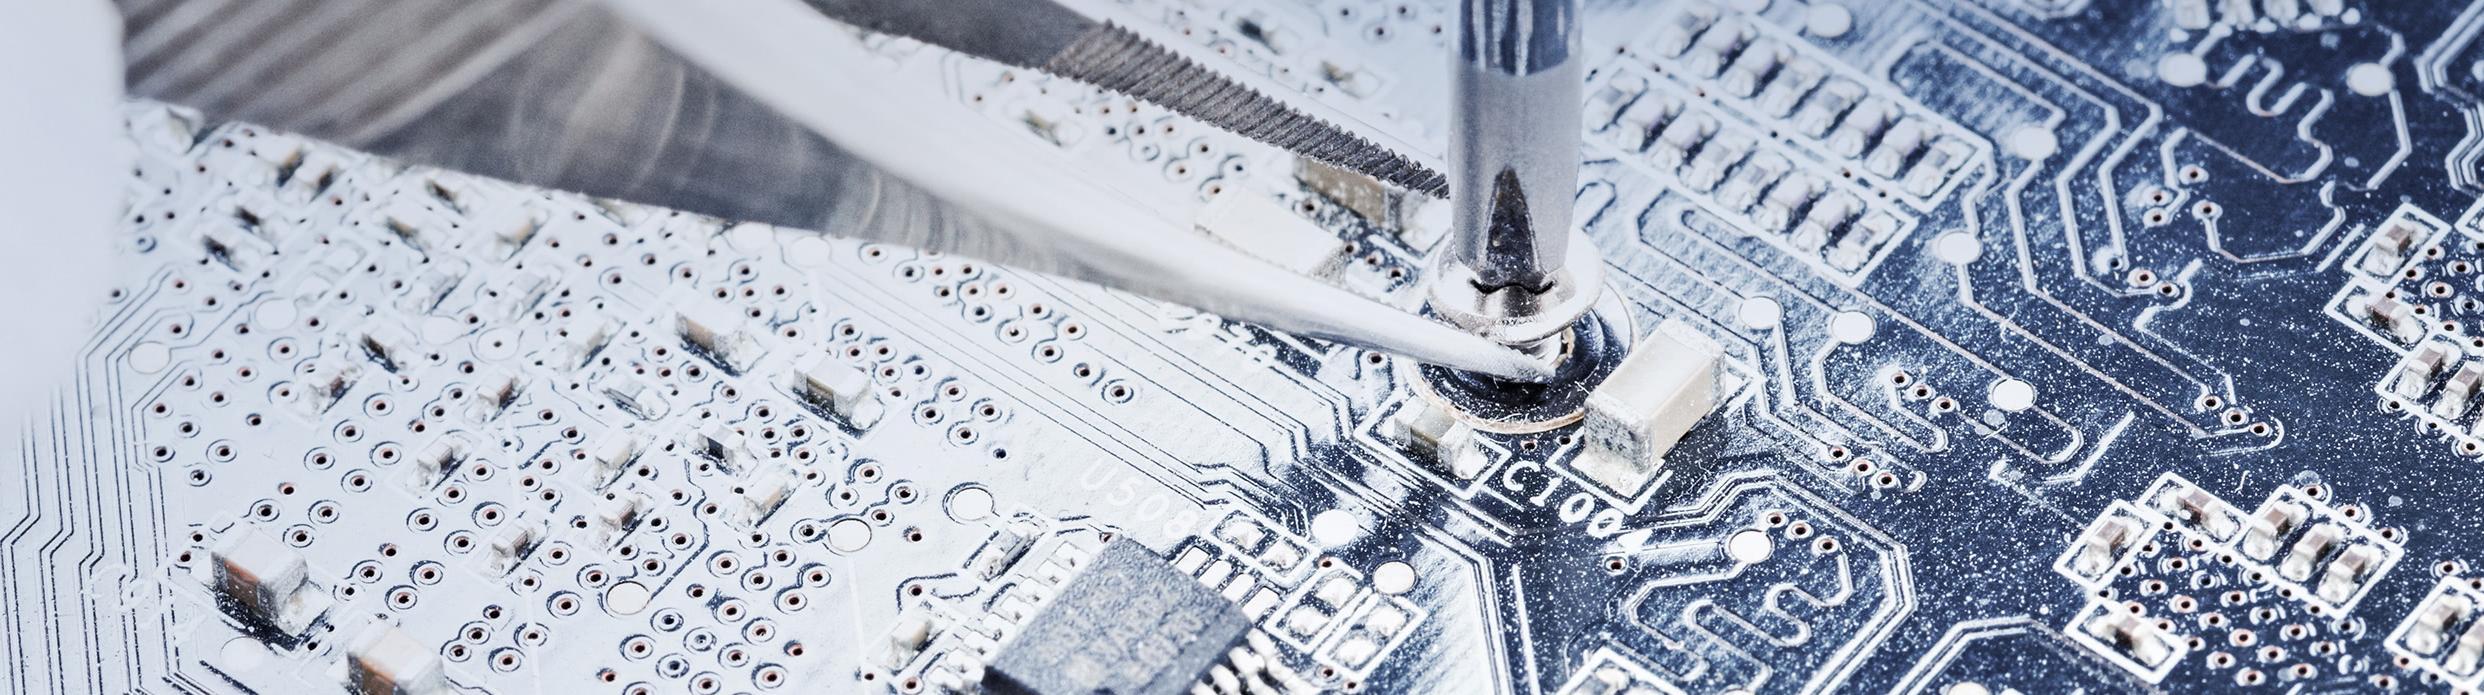 Beratung Elektronik und Elektrotechnik